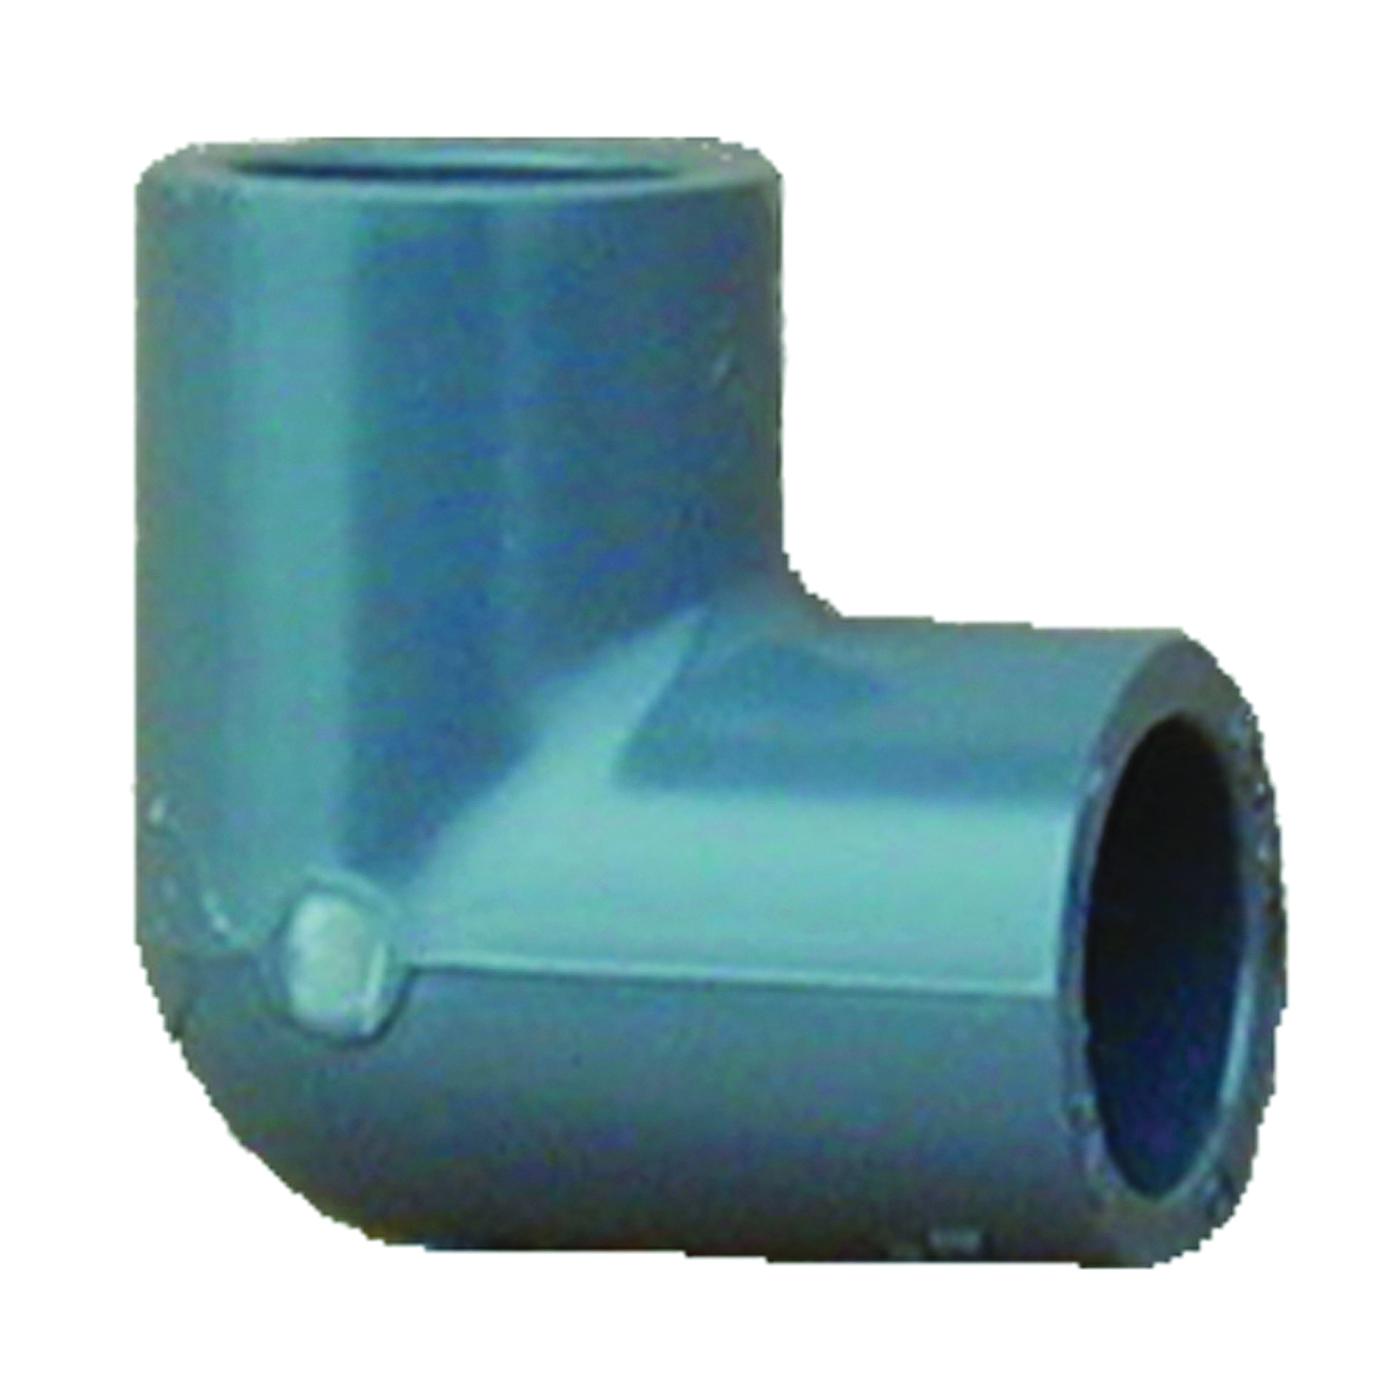 Picture of GENOVA 300 307078 Pipe Elbow, 3/4 in, Slip, 90 deg Angle, PVC, Gray, SCH 80 Schedule